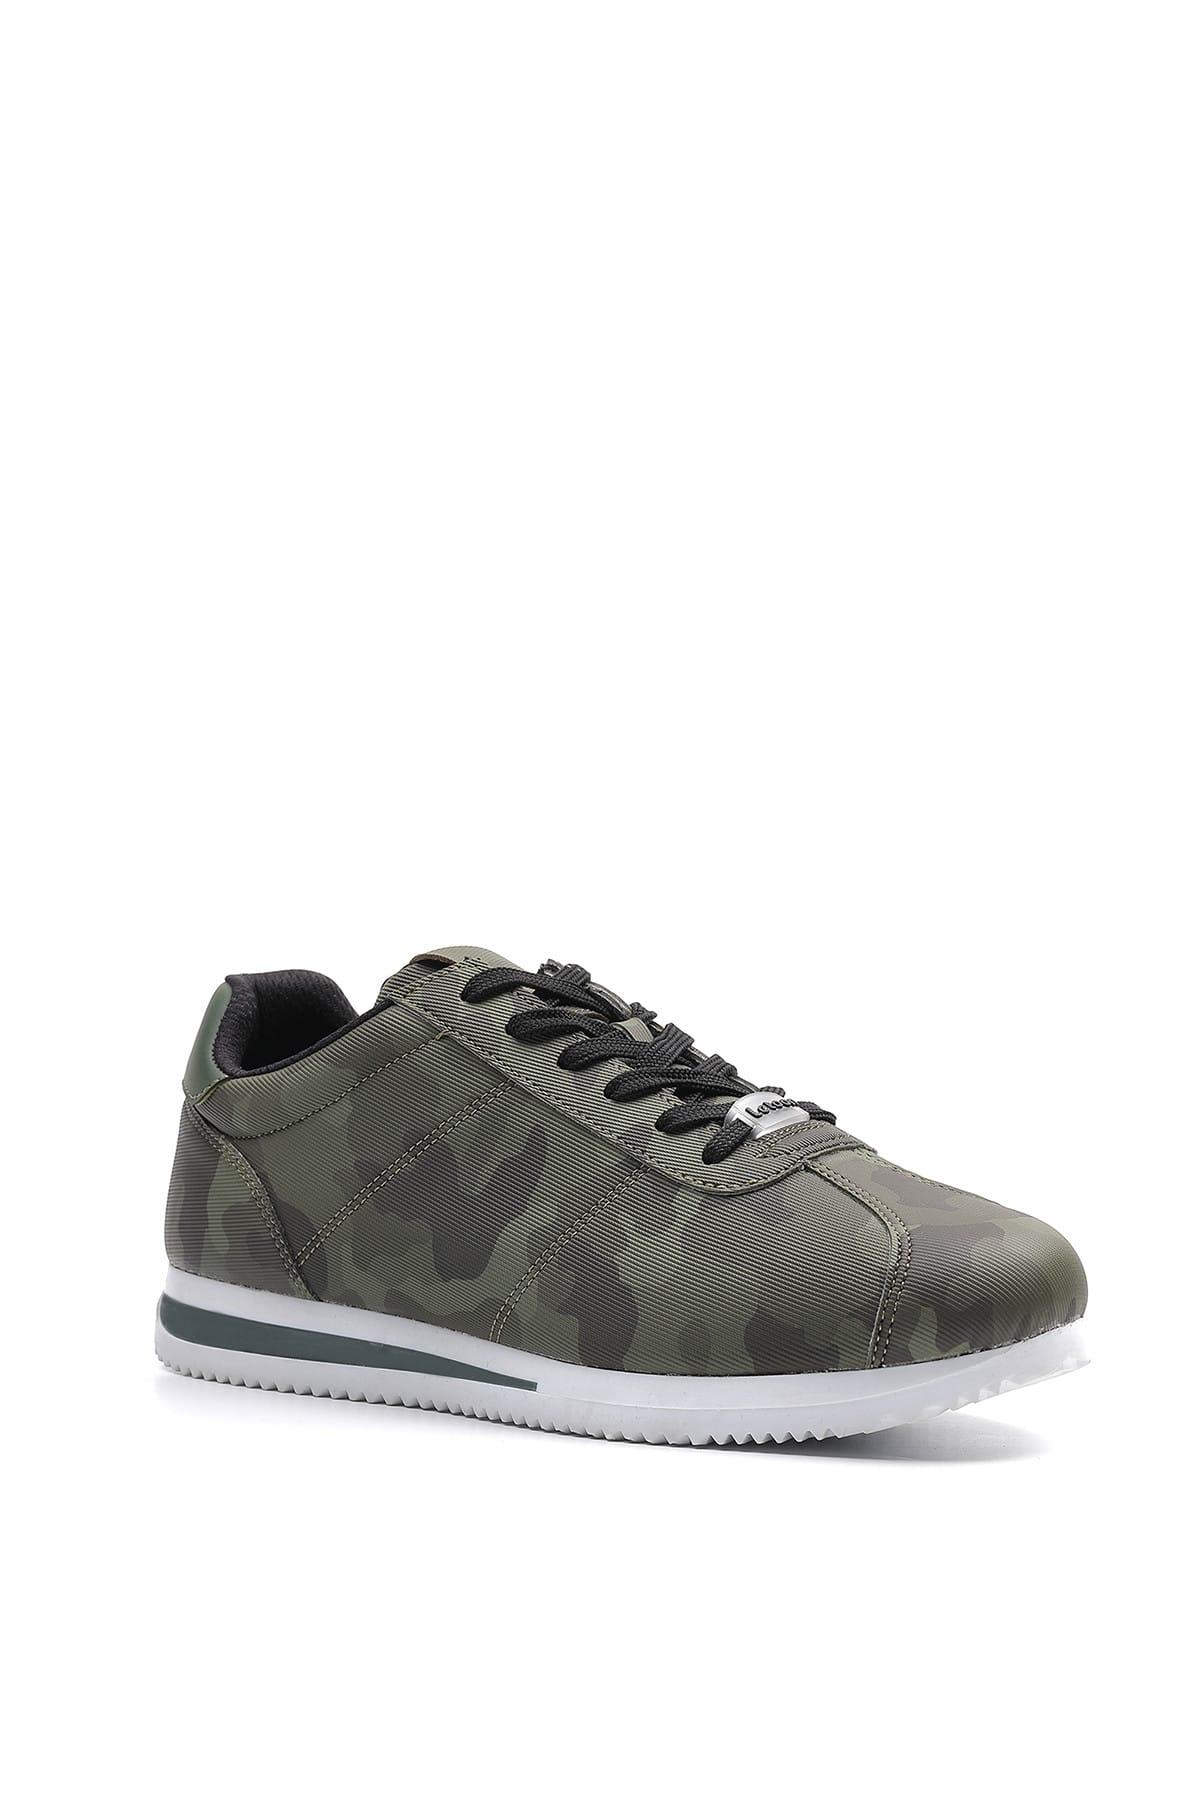 LETOON Erkek haki Sneaker - 7022T - 001M 7022T 2